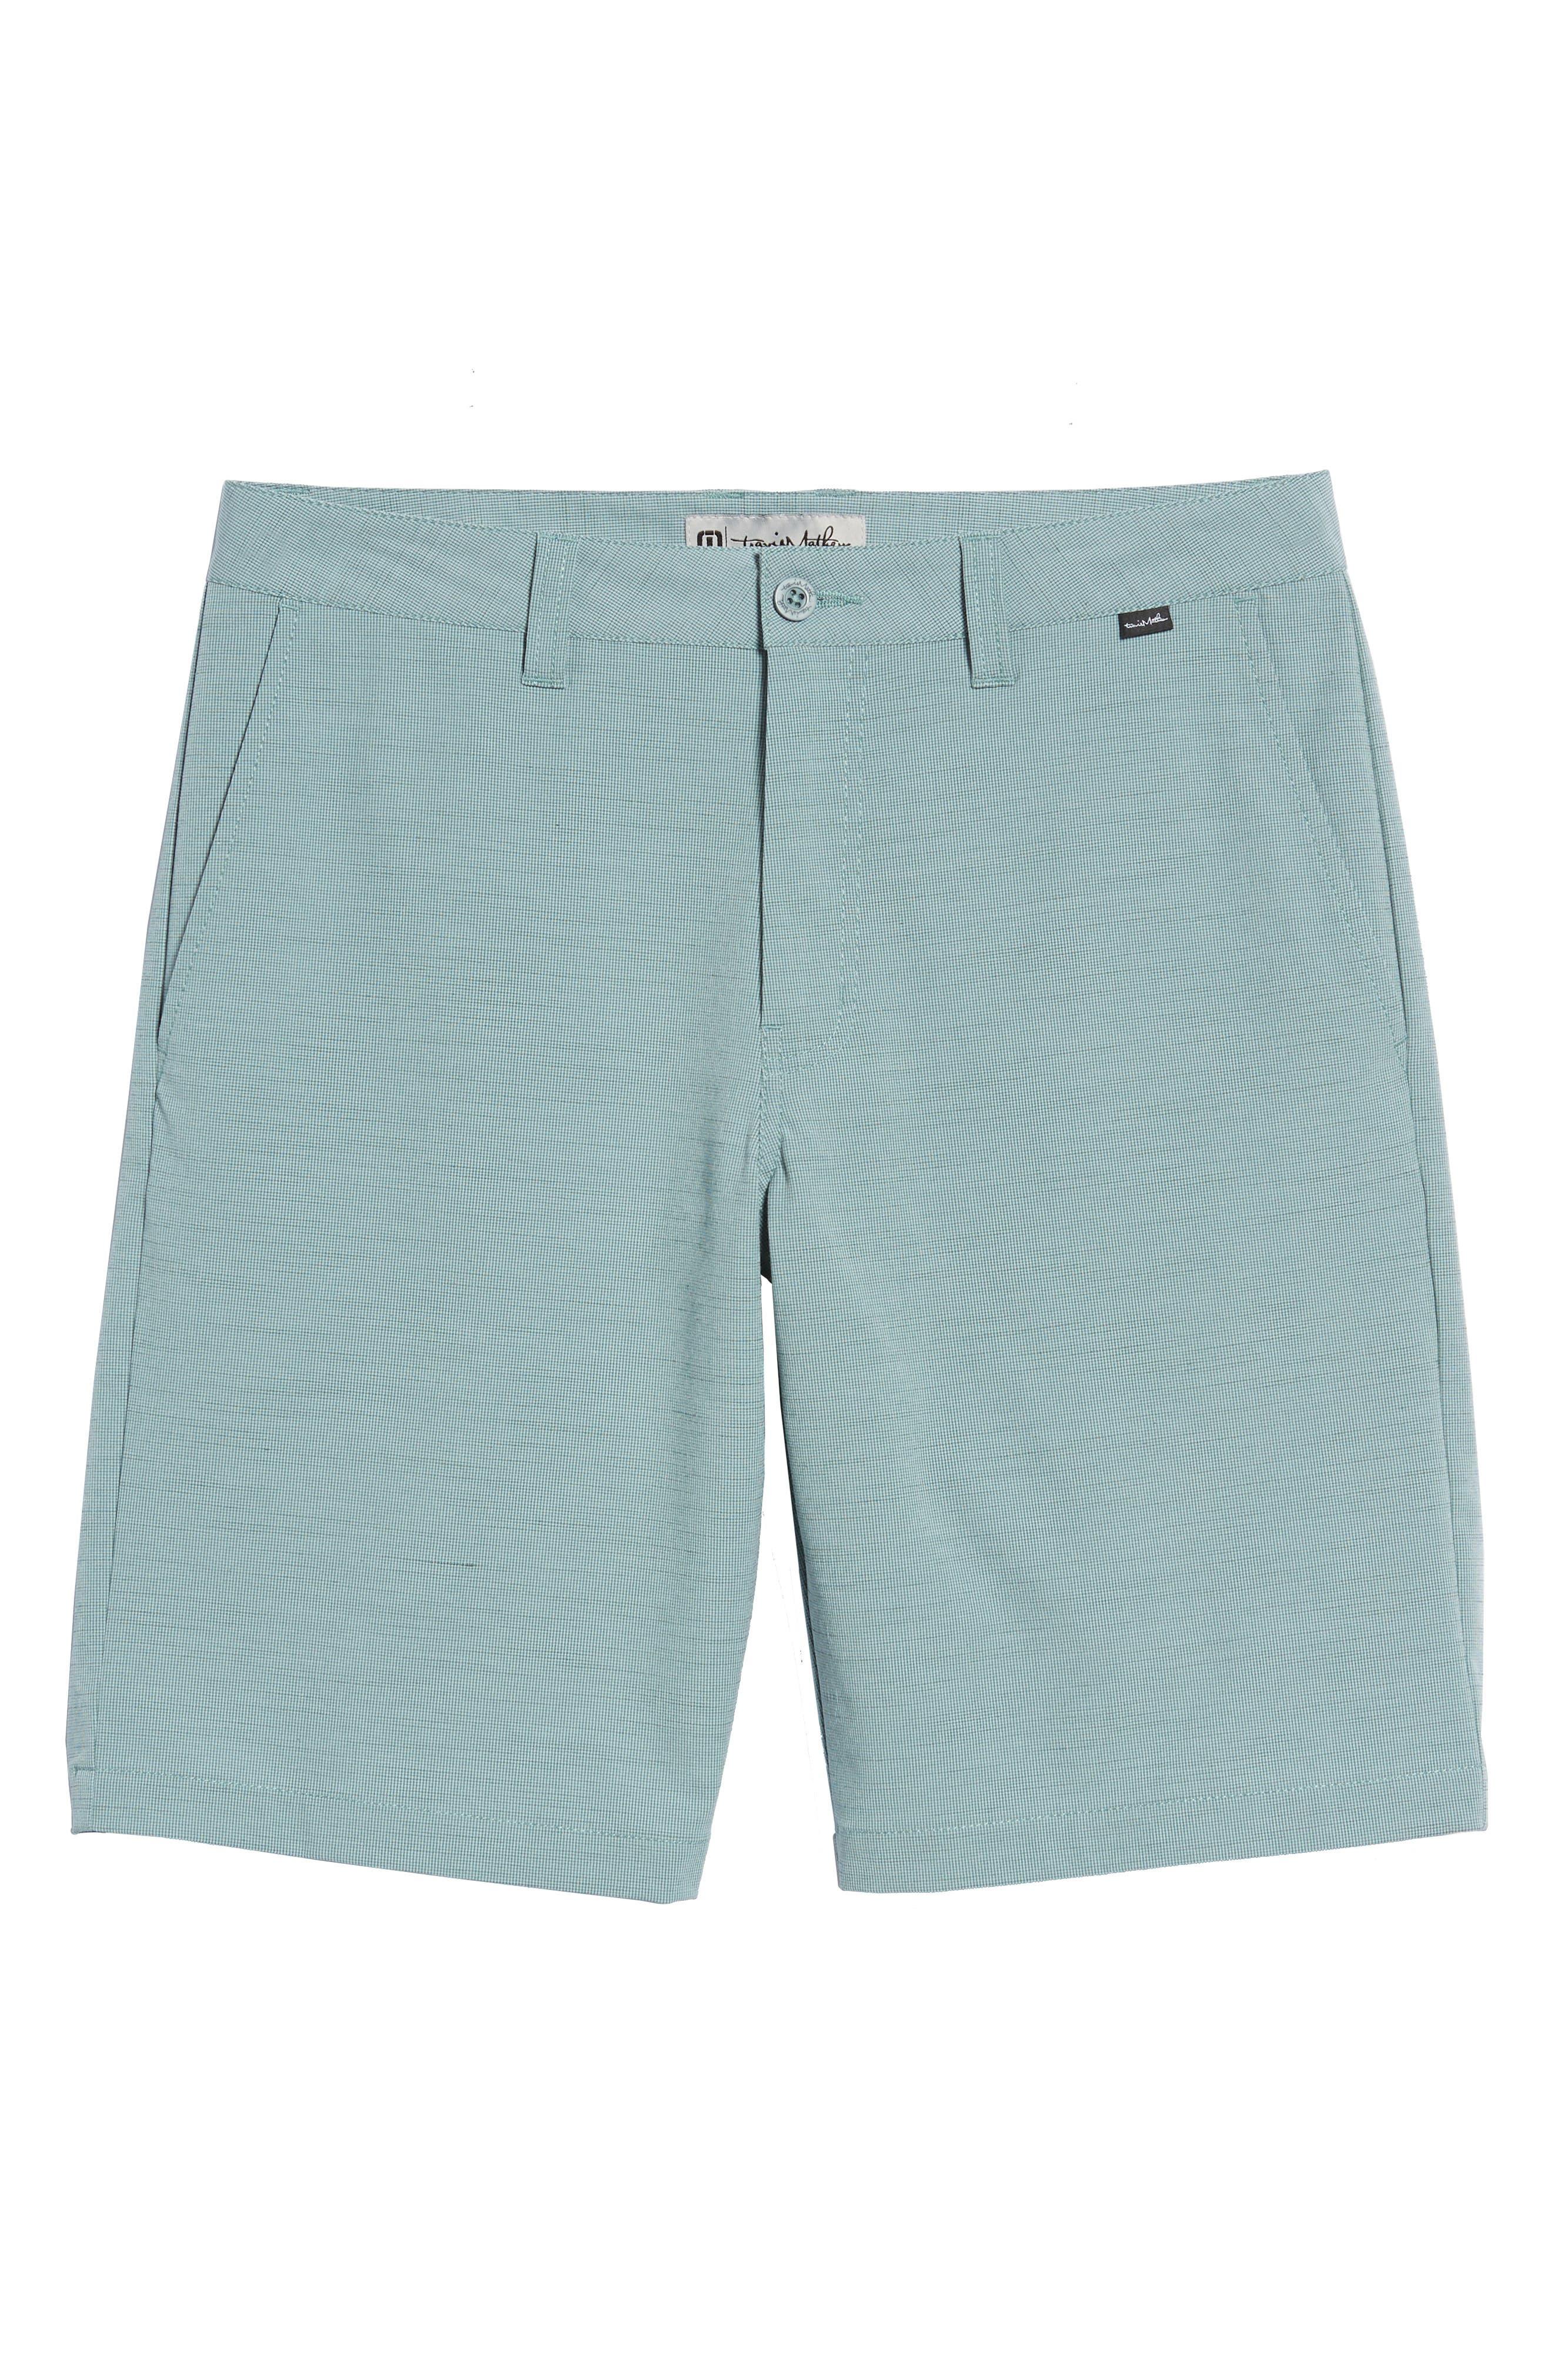 Tulum Stretch Shorts,                             Alternate thumbnail 6, color,                             300